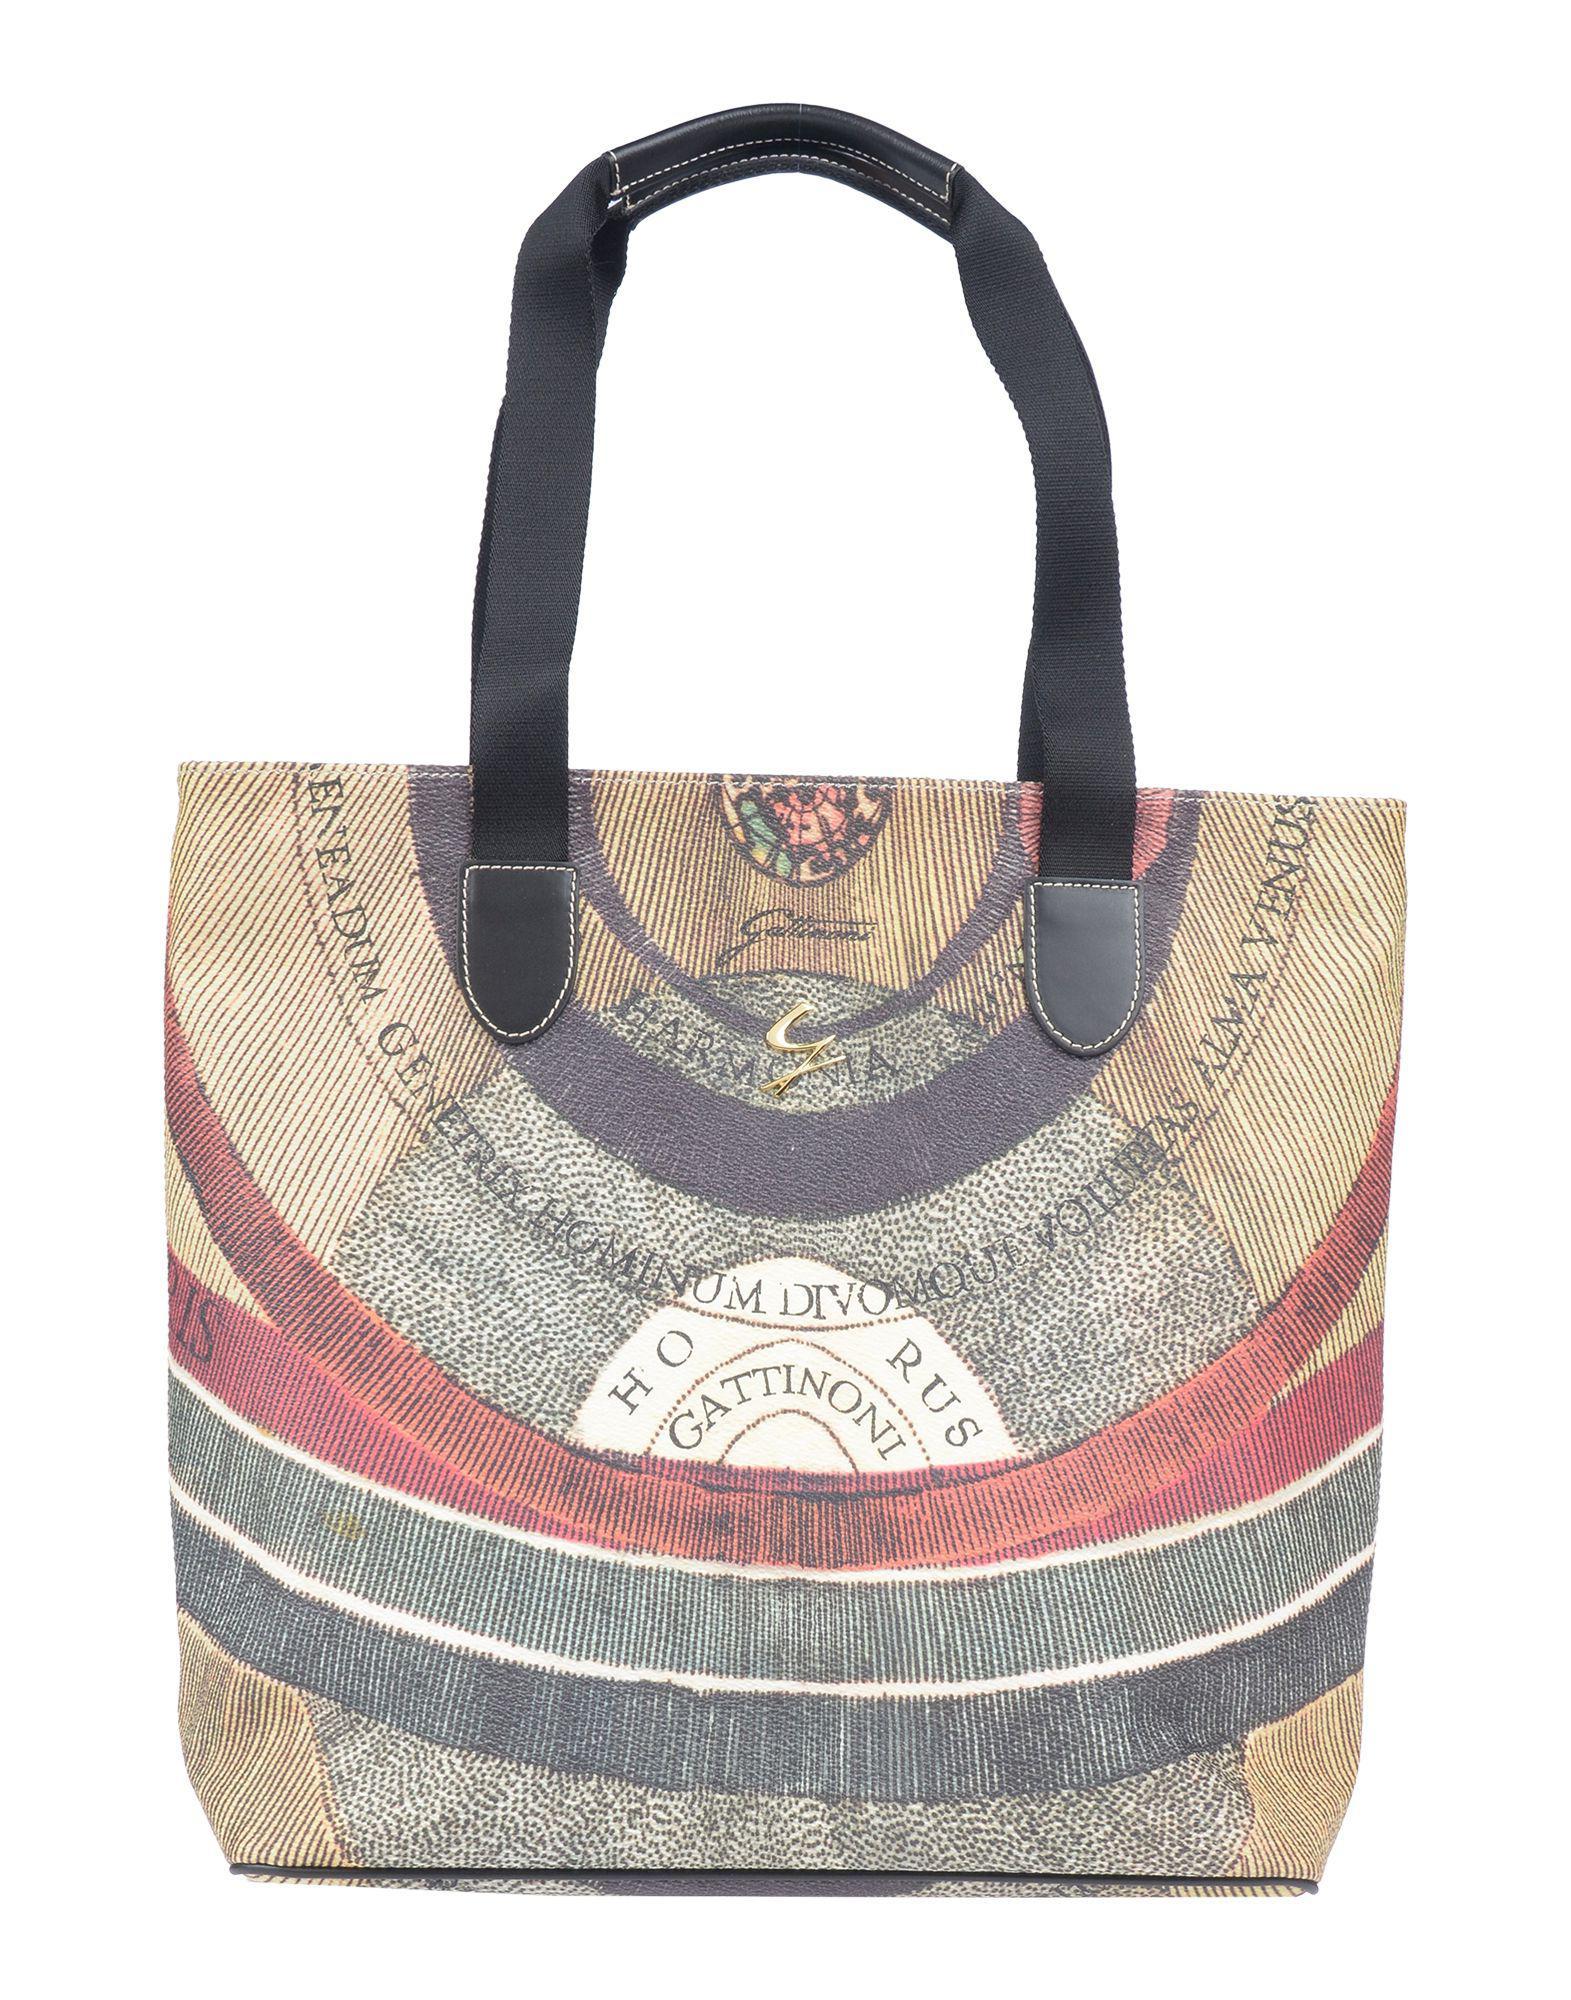 8270a3ff097 Gattinoni Shoulder Bag Shoulder Gattinoni Lyst Bag rPrq7w8S